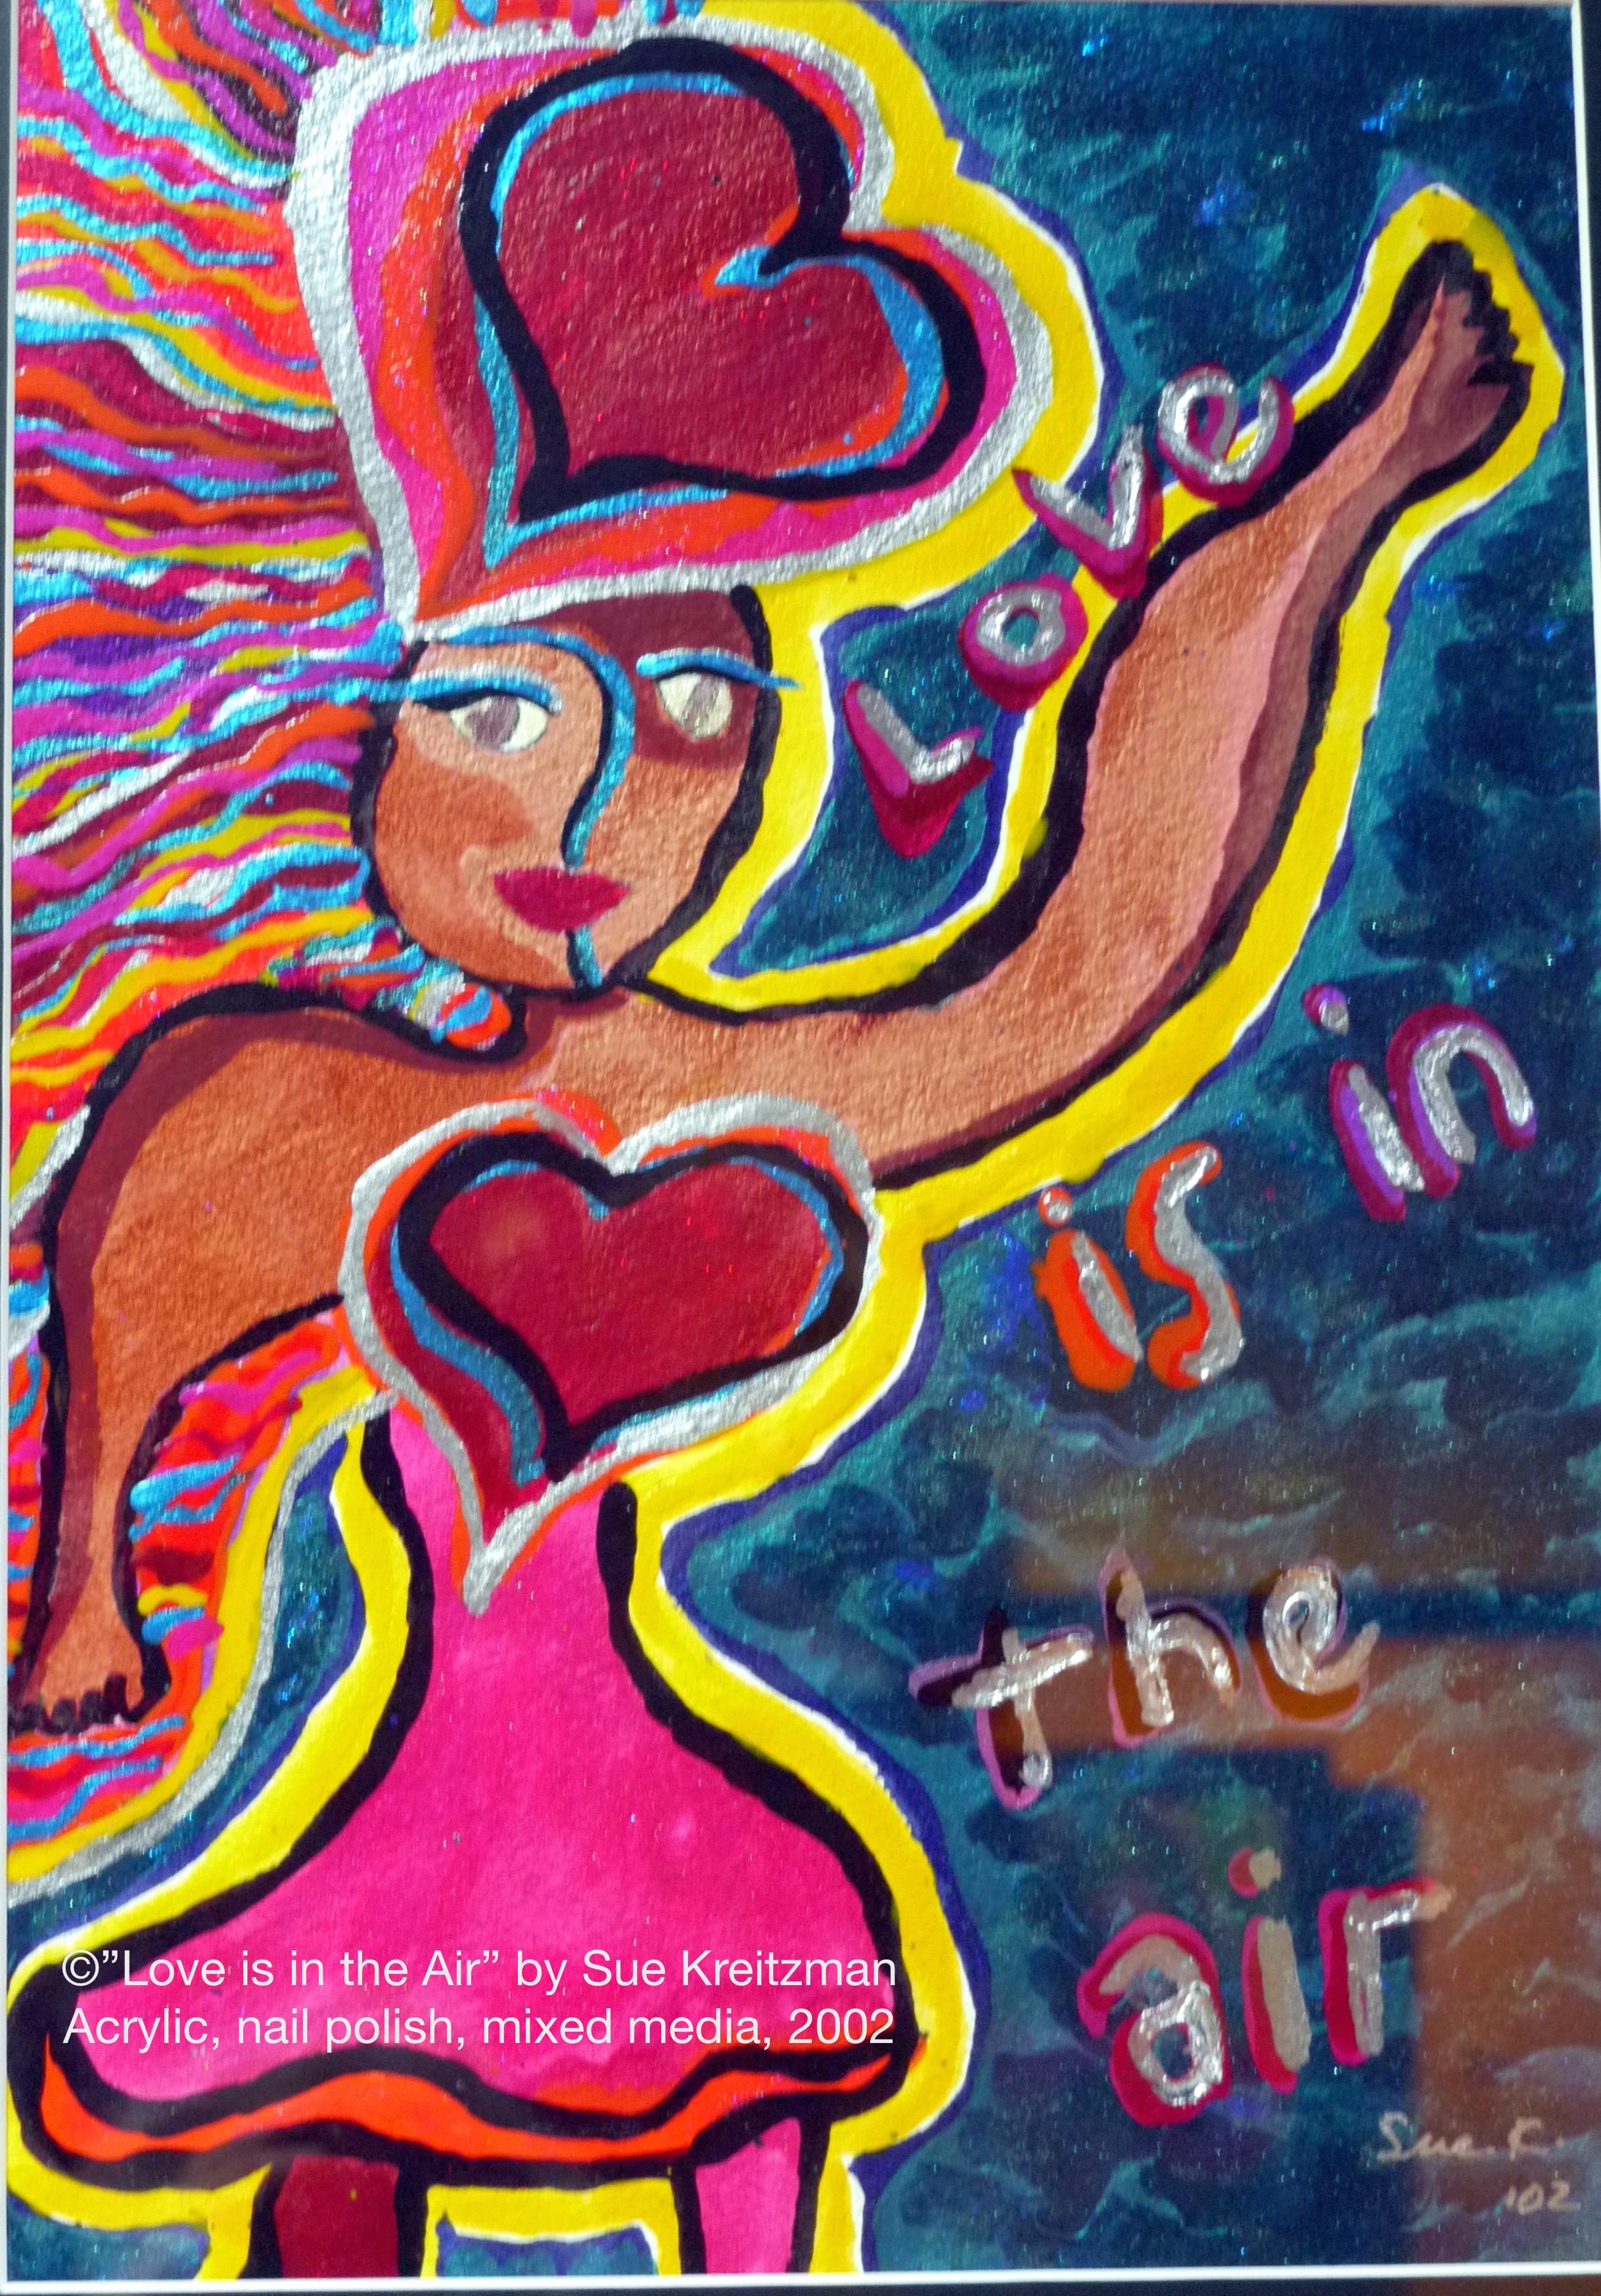 Sue Kreitzman Out of Bounds Freedom of Expression Shelita Birchett Benash Curator, 2015